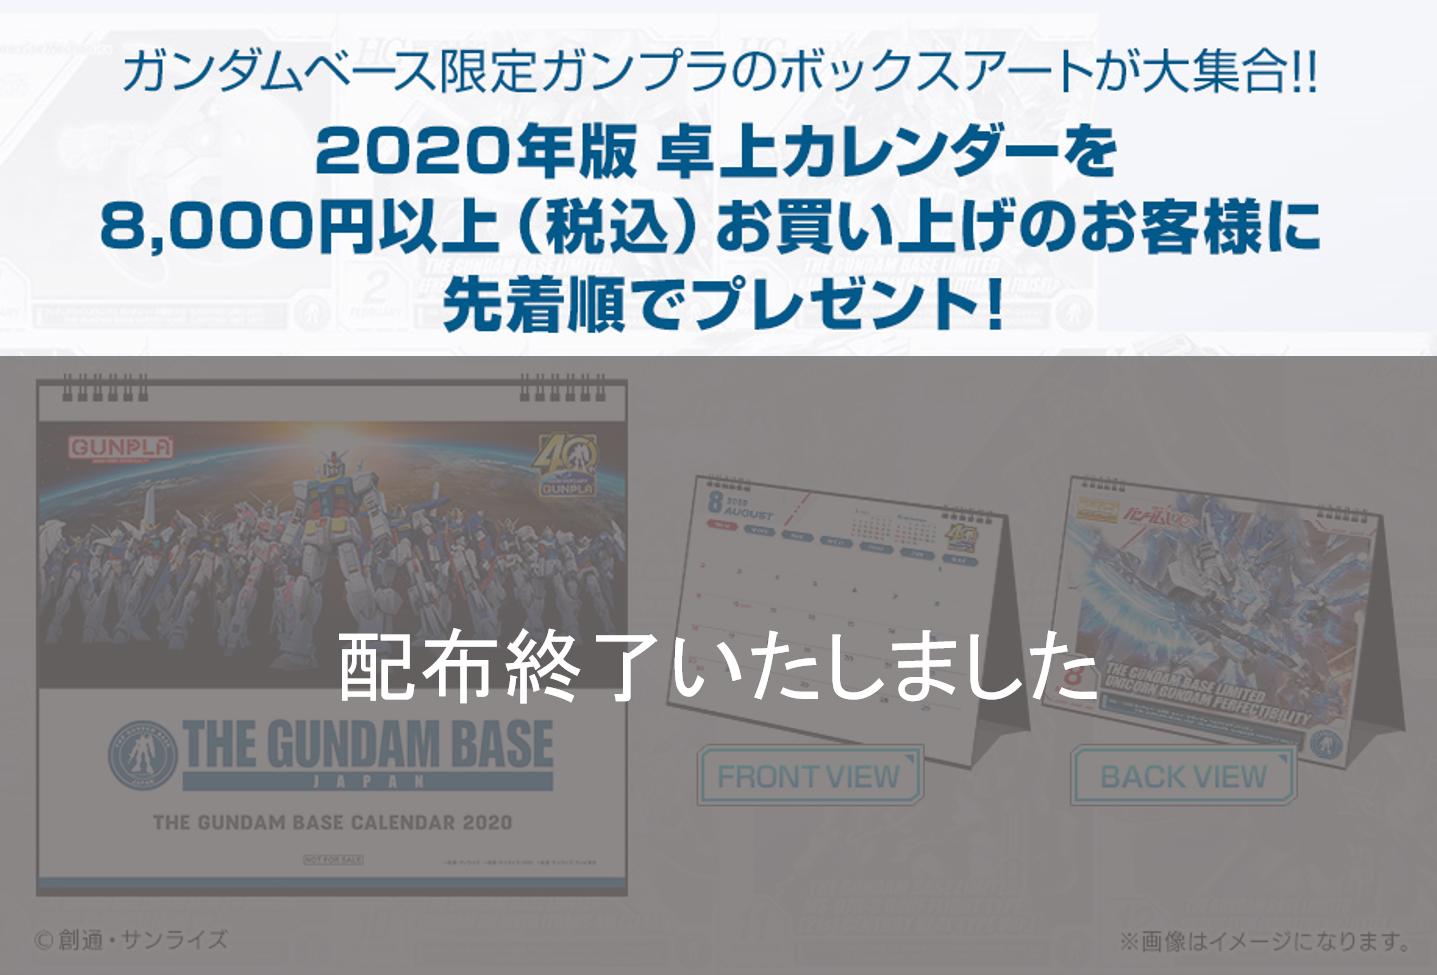 THE GUNDAM BASE TOKYO CALENDAR 2020